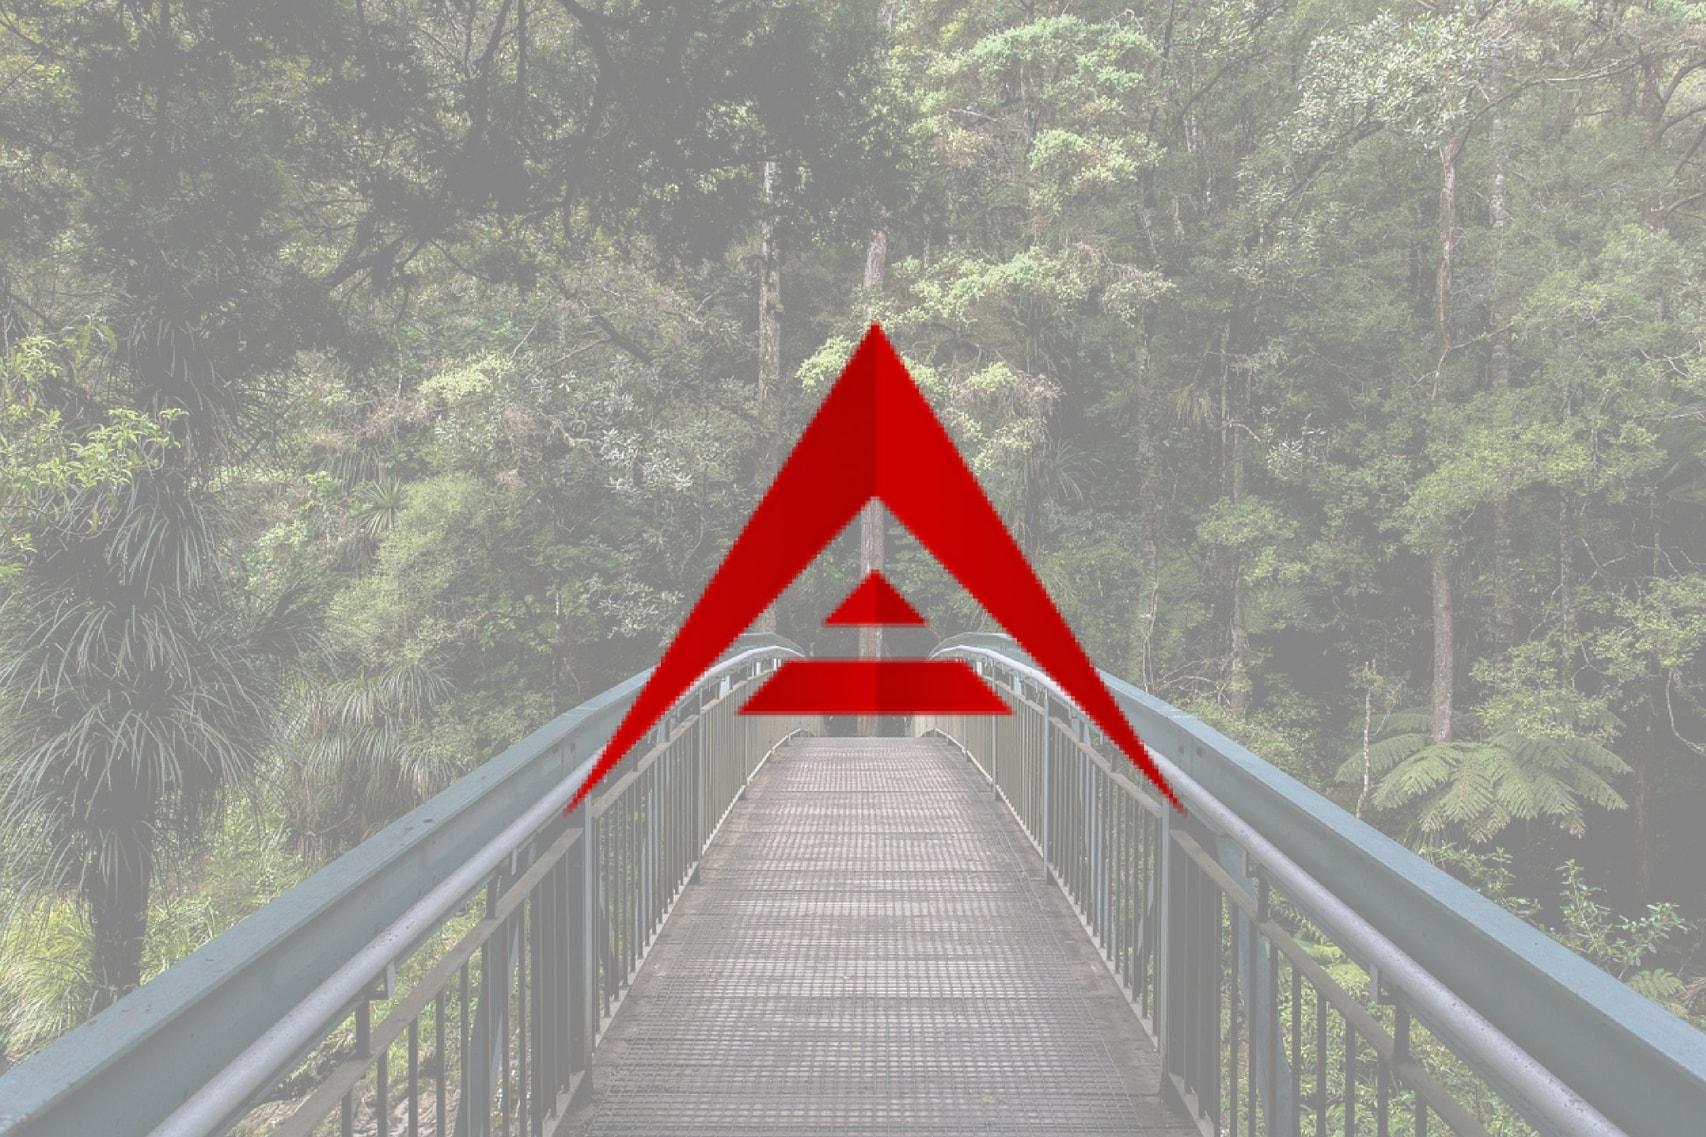 Arks News Roundup: June